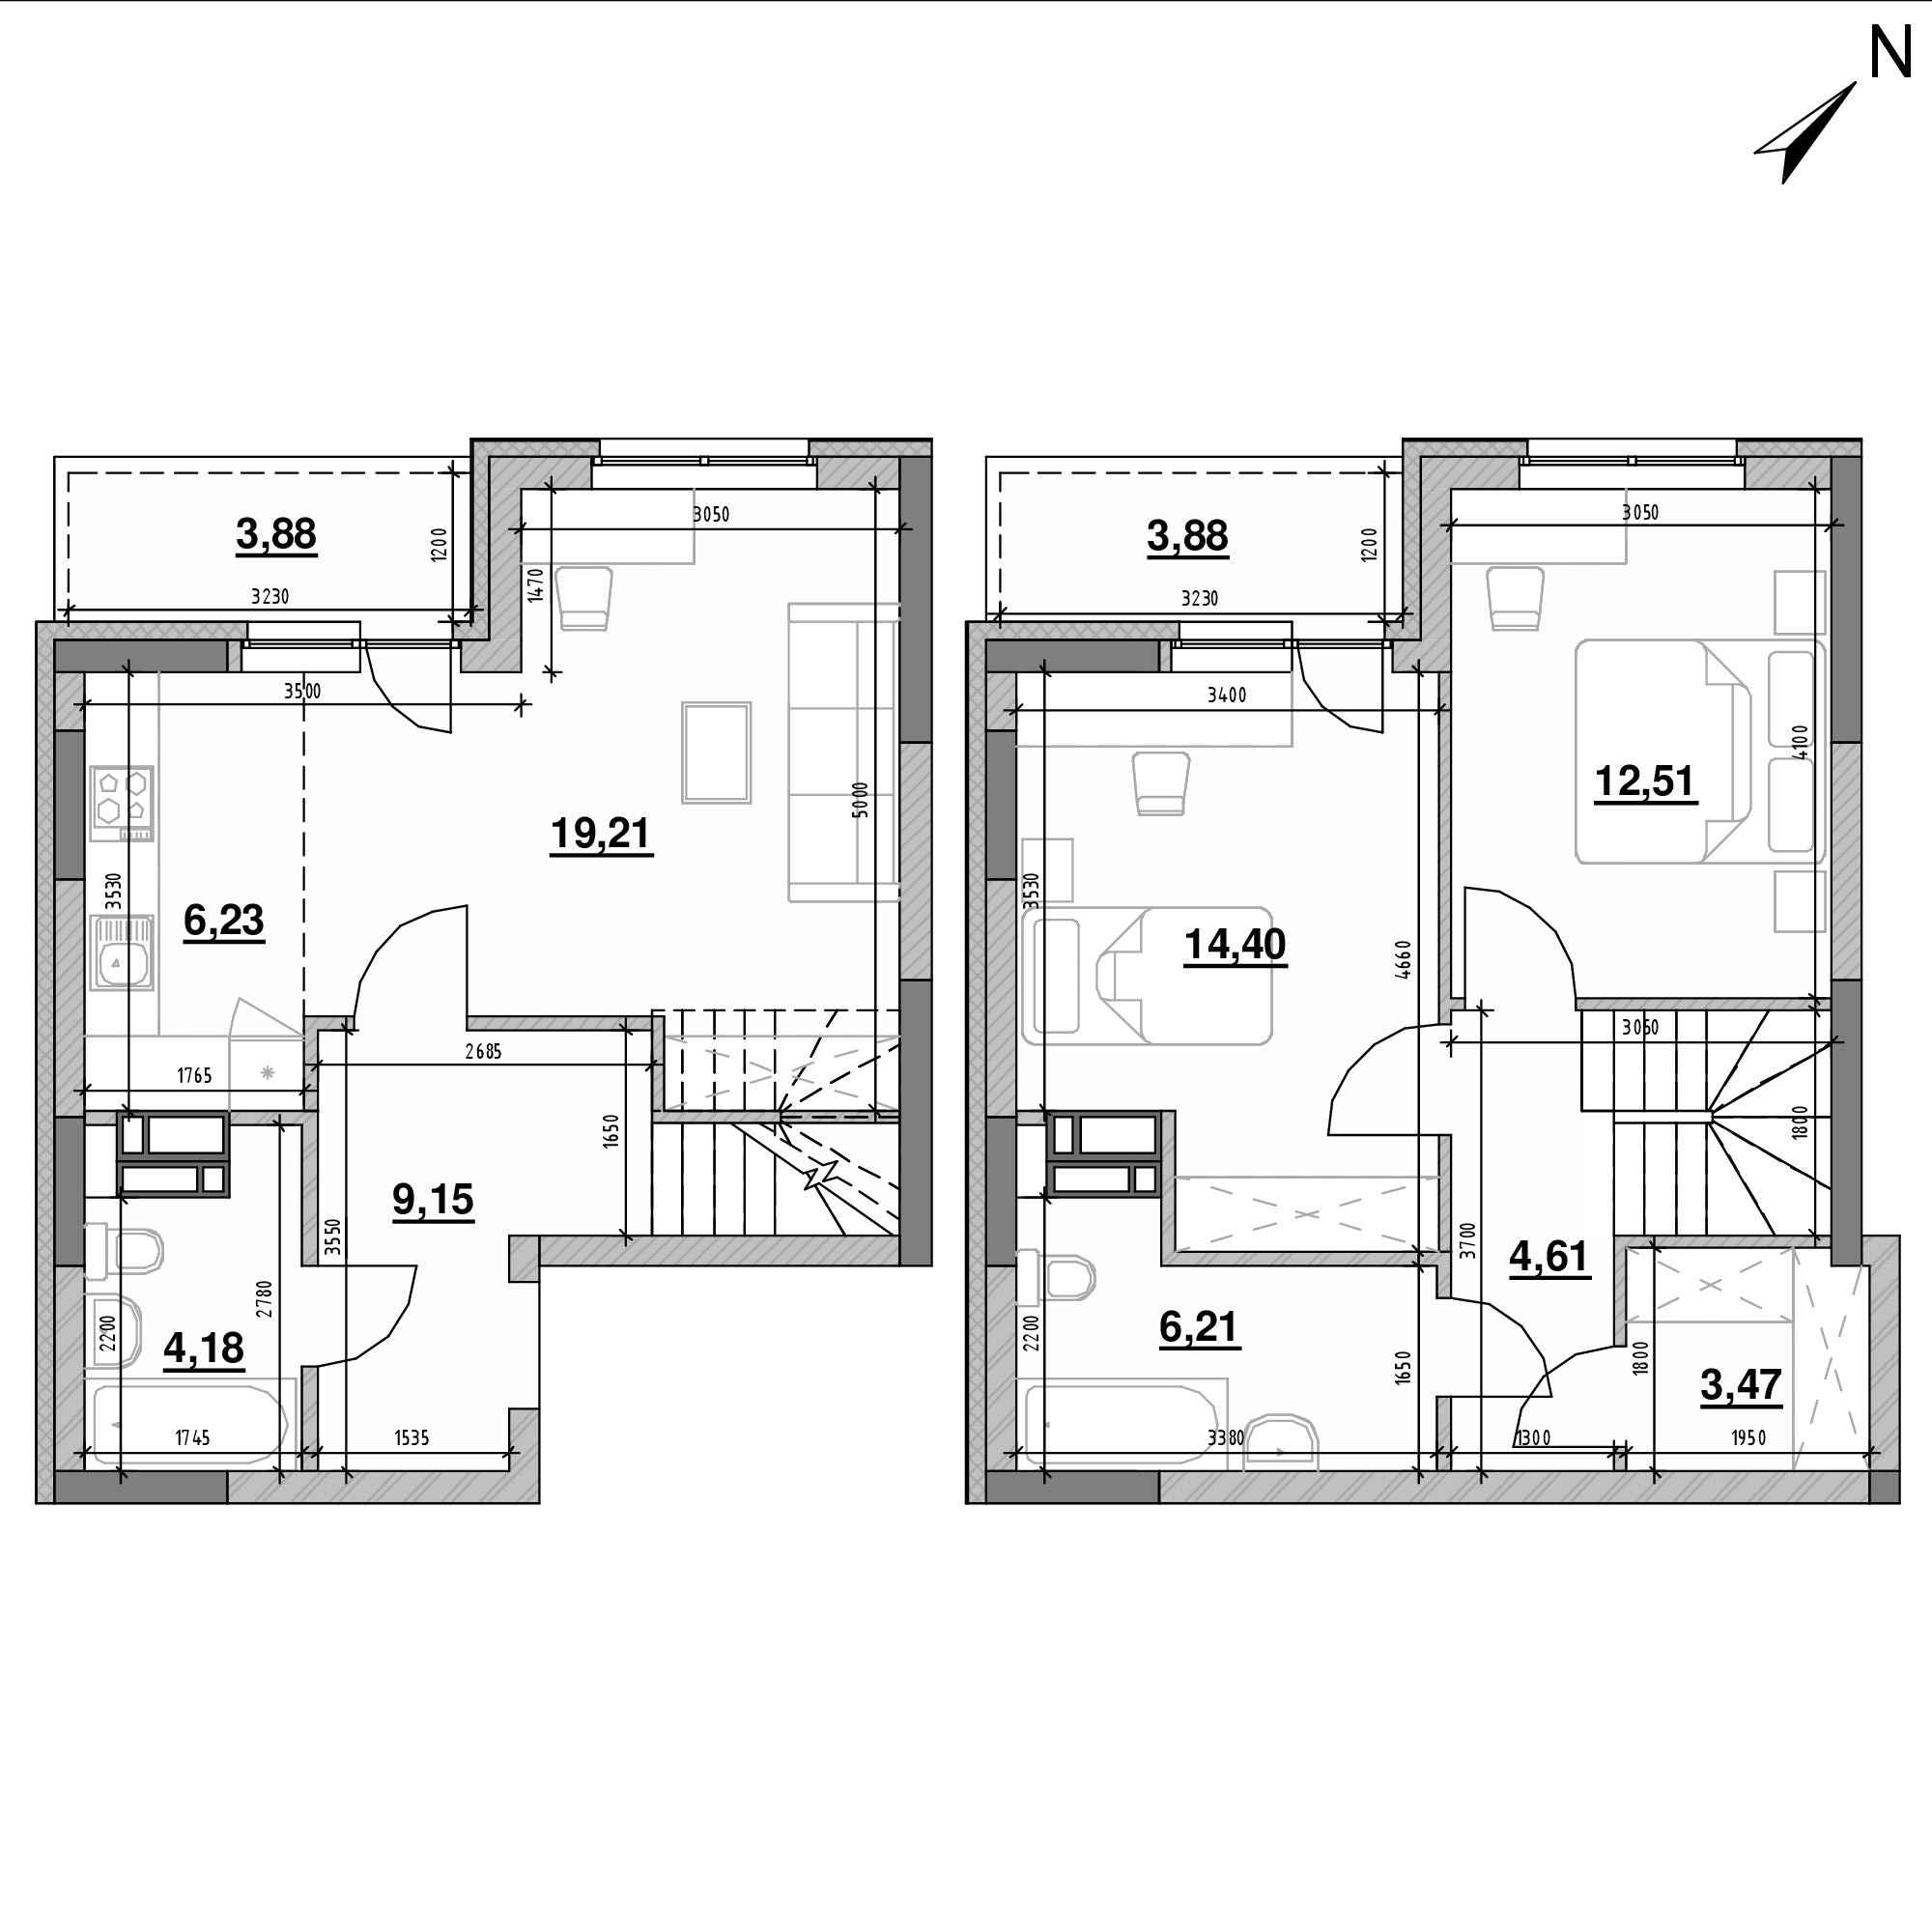 ЖК Оk'Land: планування 3-кімнатної квартири, №631, 87.73 м<sup>2</sup>